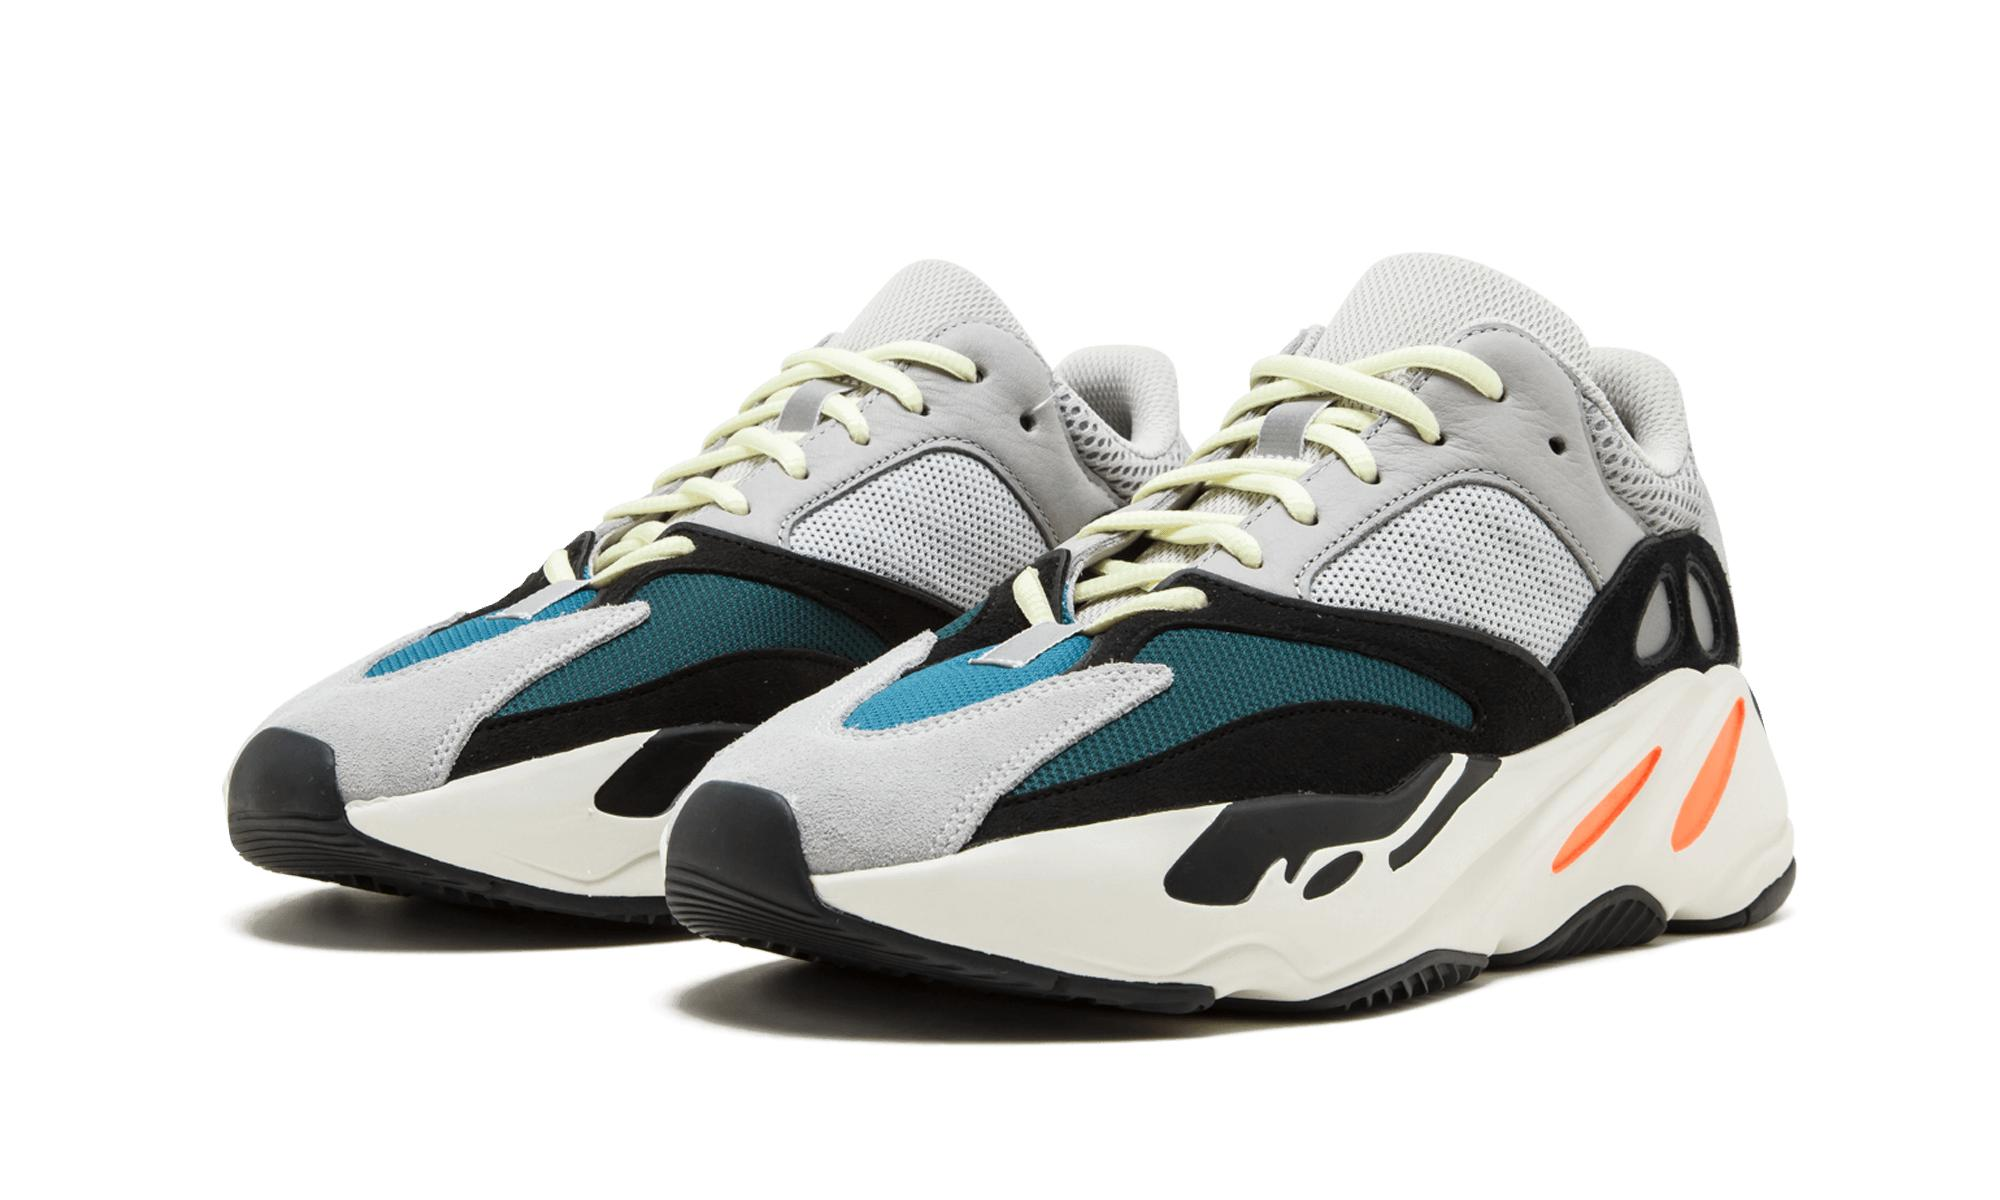 ec7b4ac3425d4 Adidas - Multicolor Yeezy Boost 700 for Men - Lyst. View fullscreen